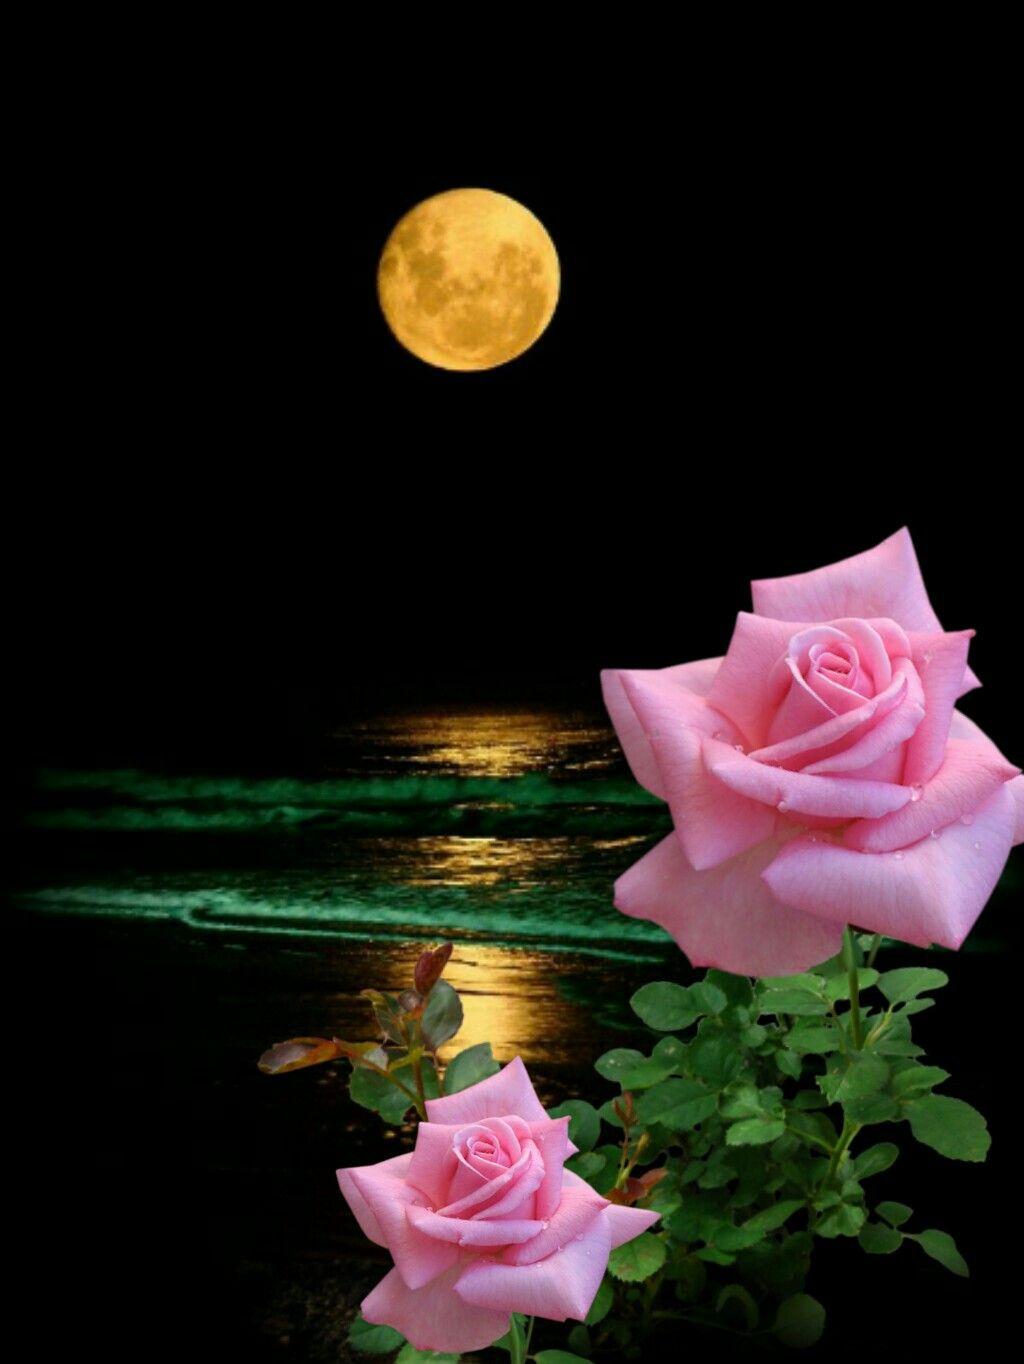 Pin by dayana martinez on rosas amor pinterest moon flowers and flowers roses bellisima good night scenery amor night skies beautiful pictures memories izmirmasajfo